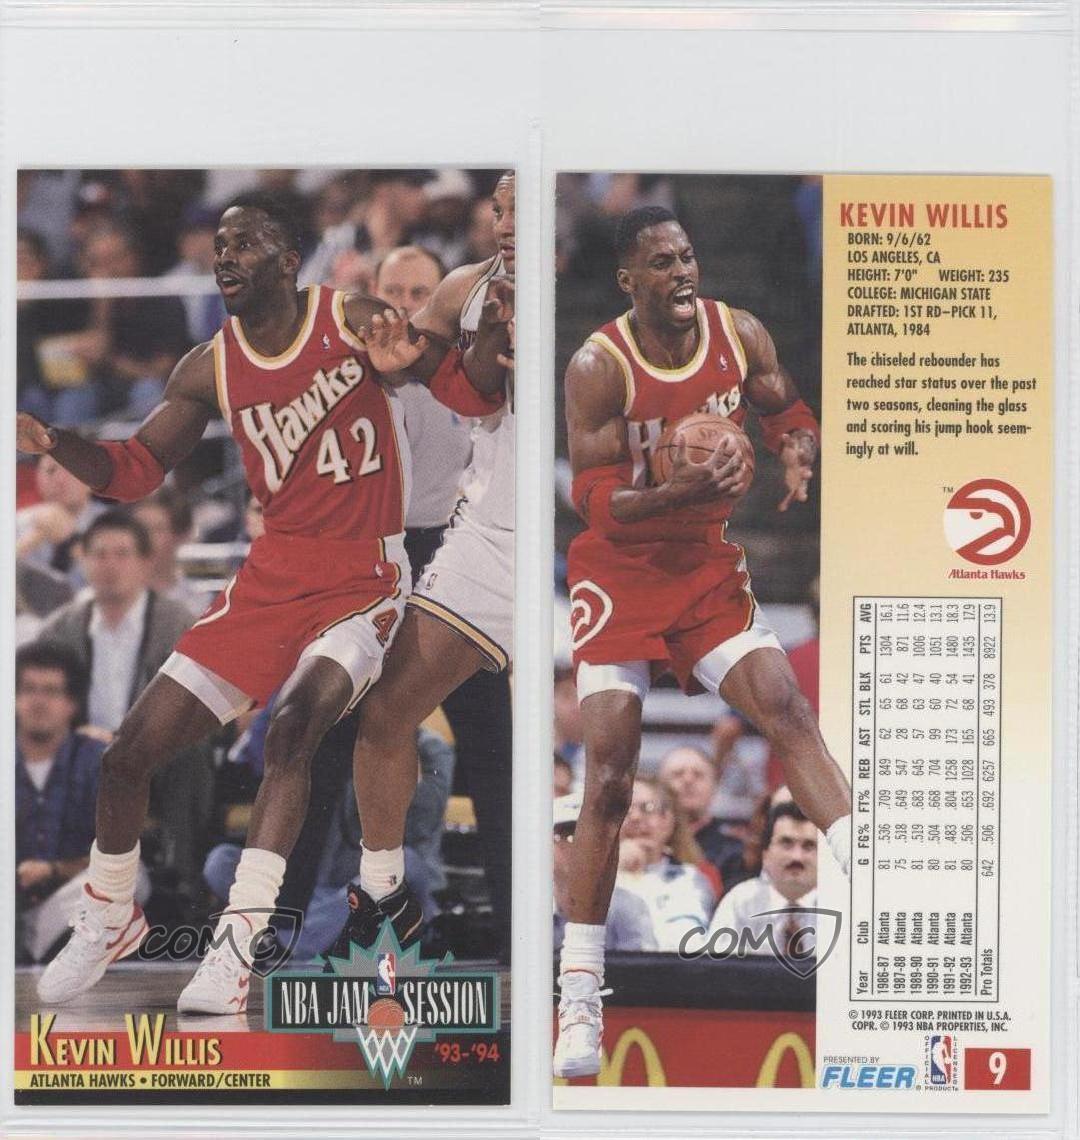 1993-94 NBA Jam Session #9 Kevin Willis Atlanta Hawks